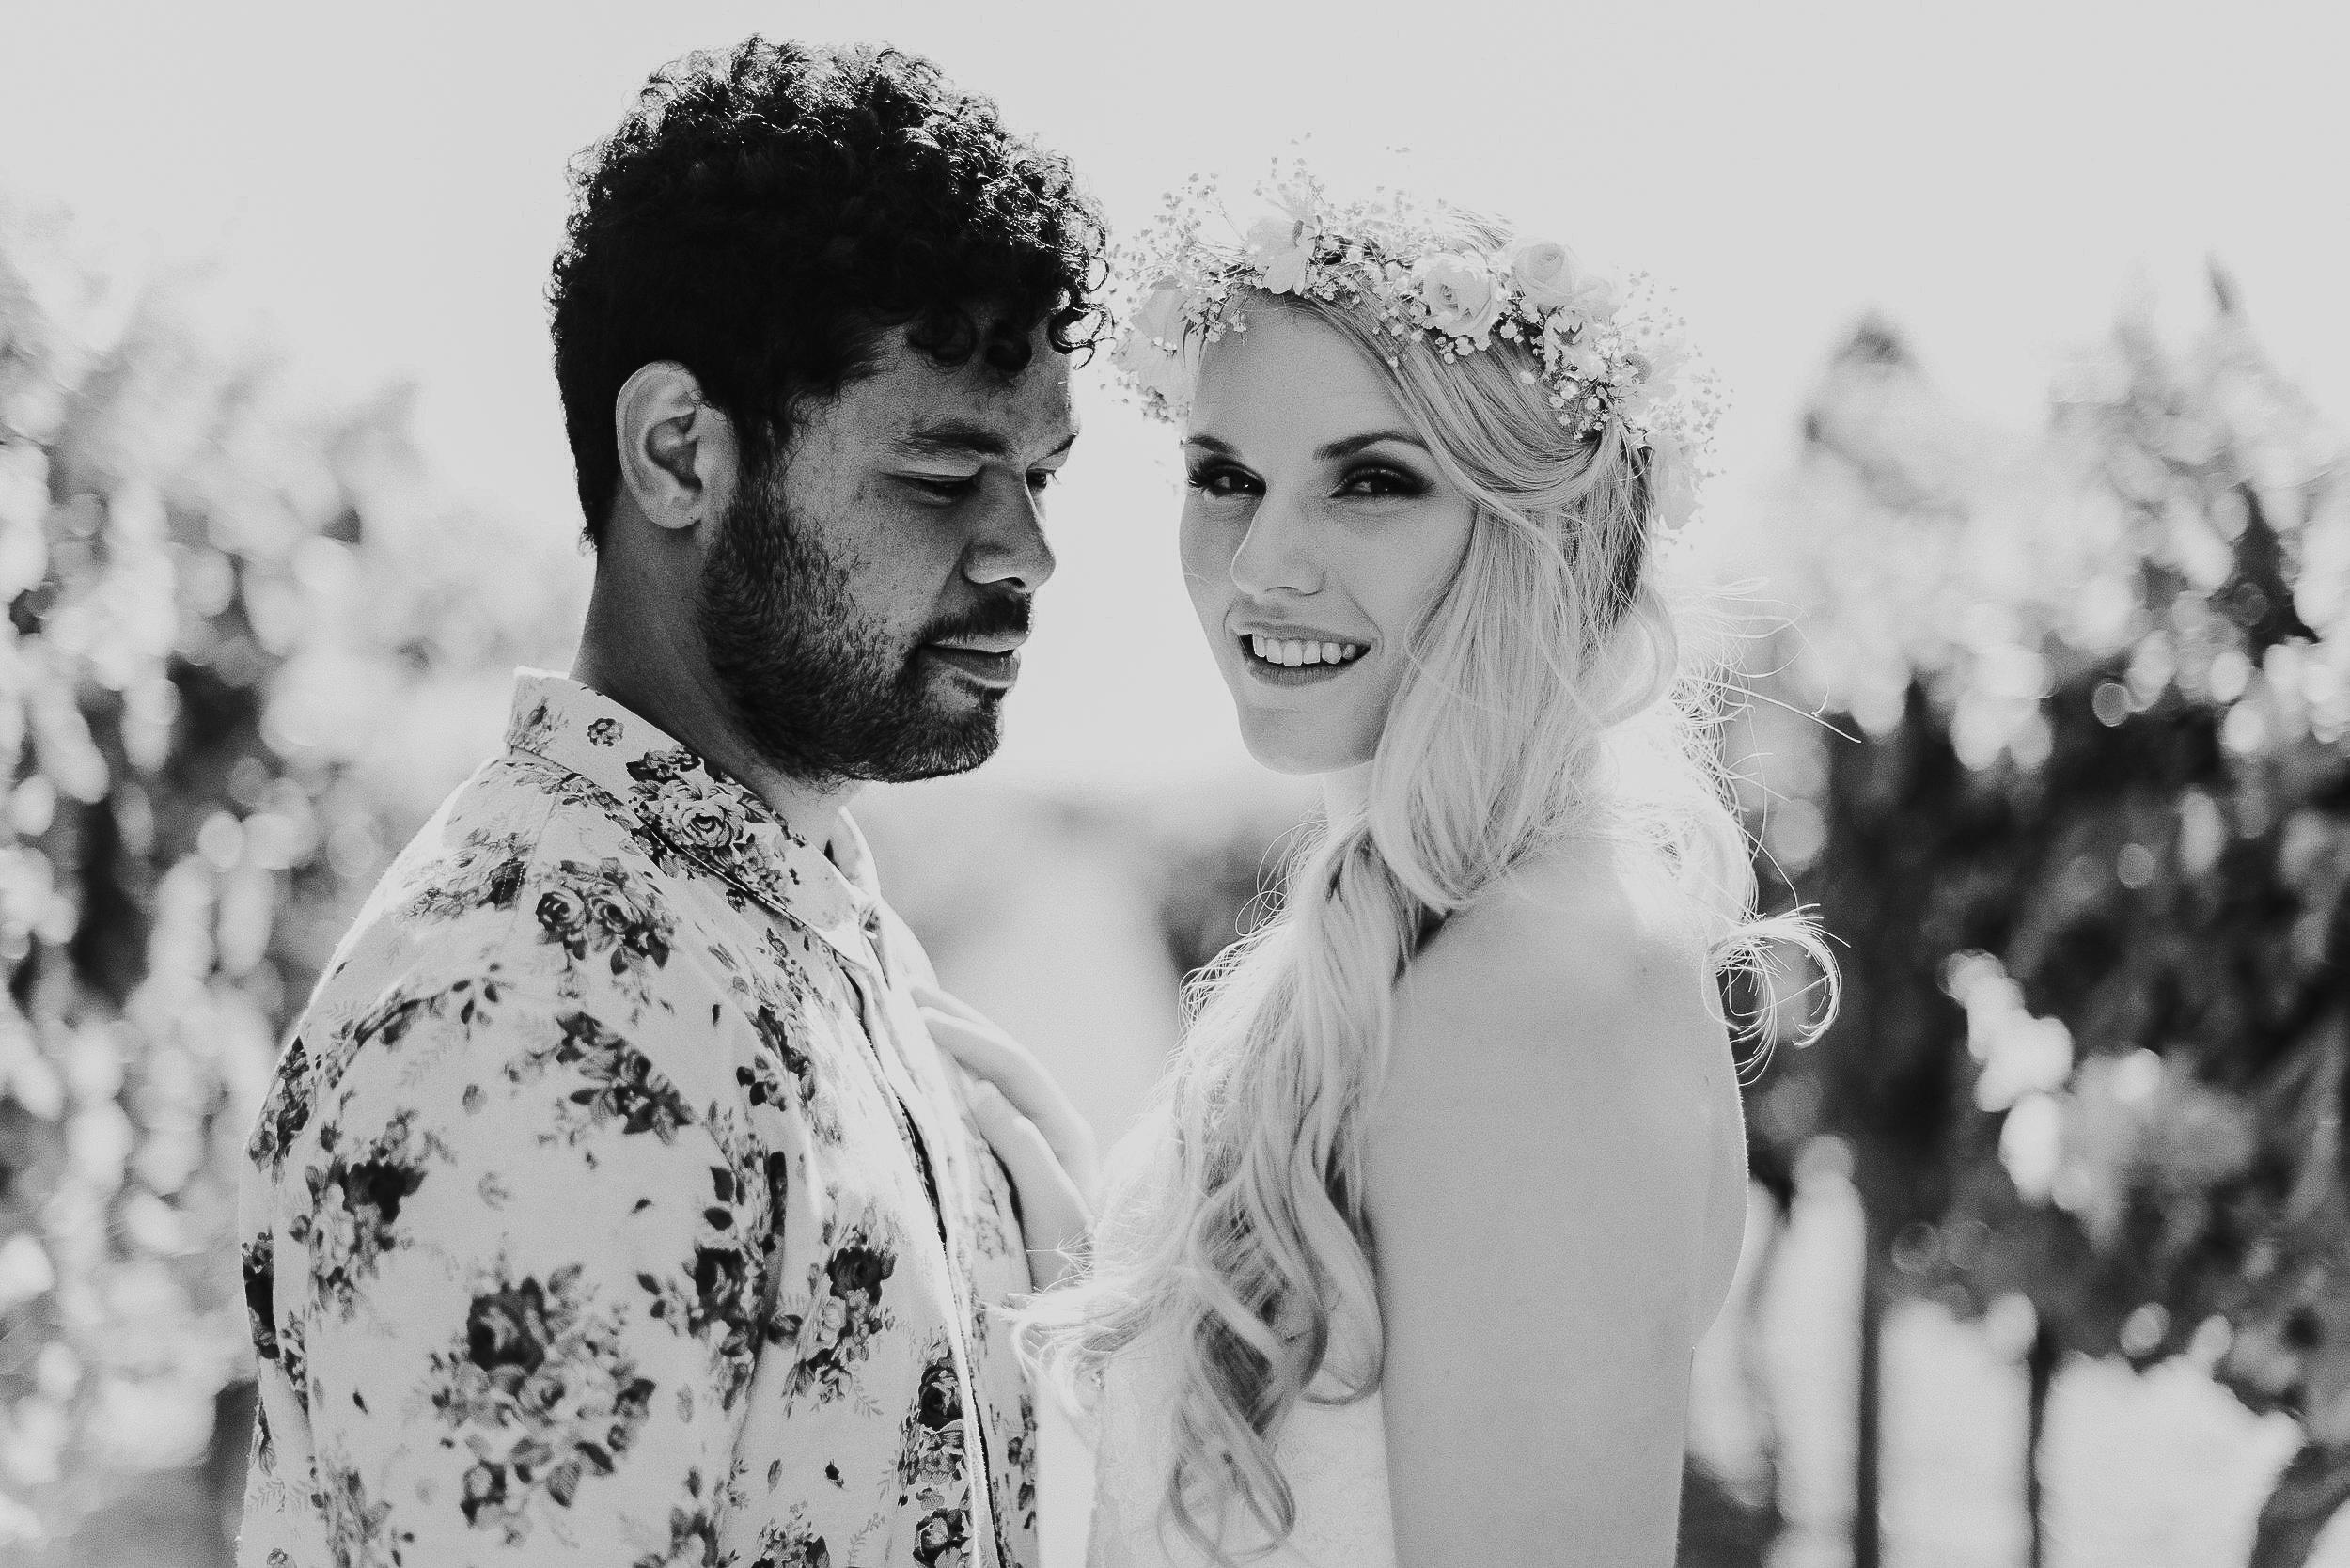 New-Zealand-Wedding-Photographer-23.jpg